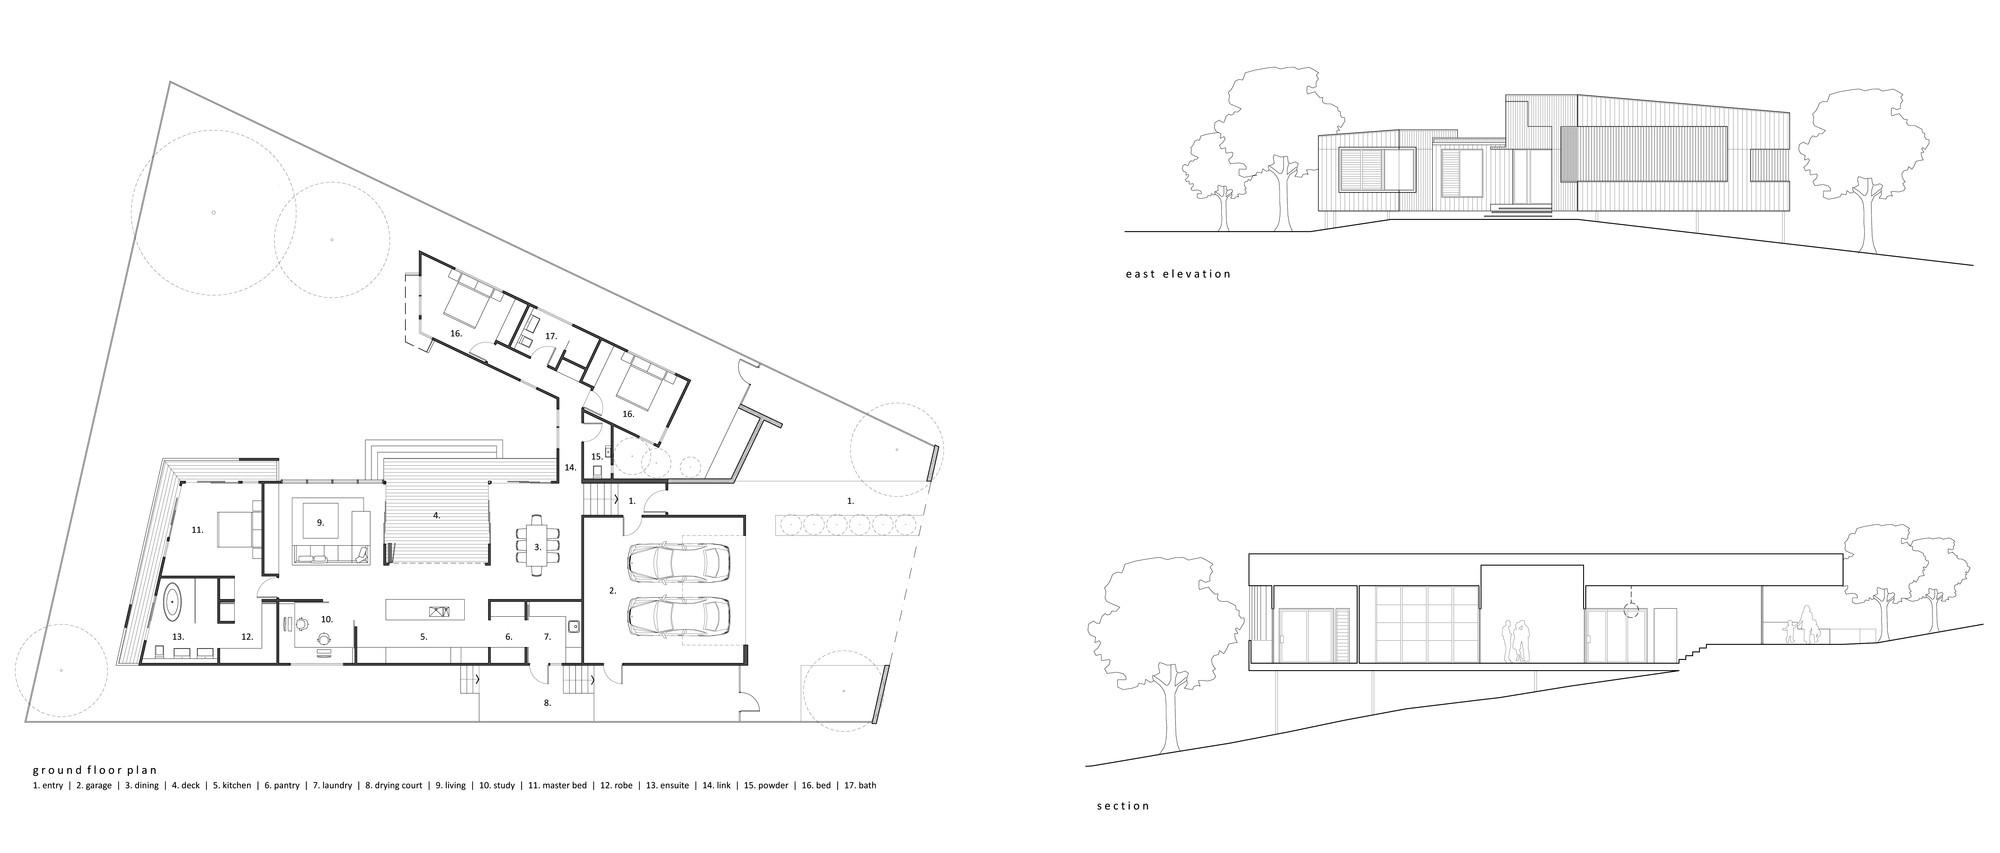 Best Floor Plan Section Elevation